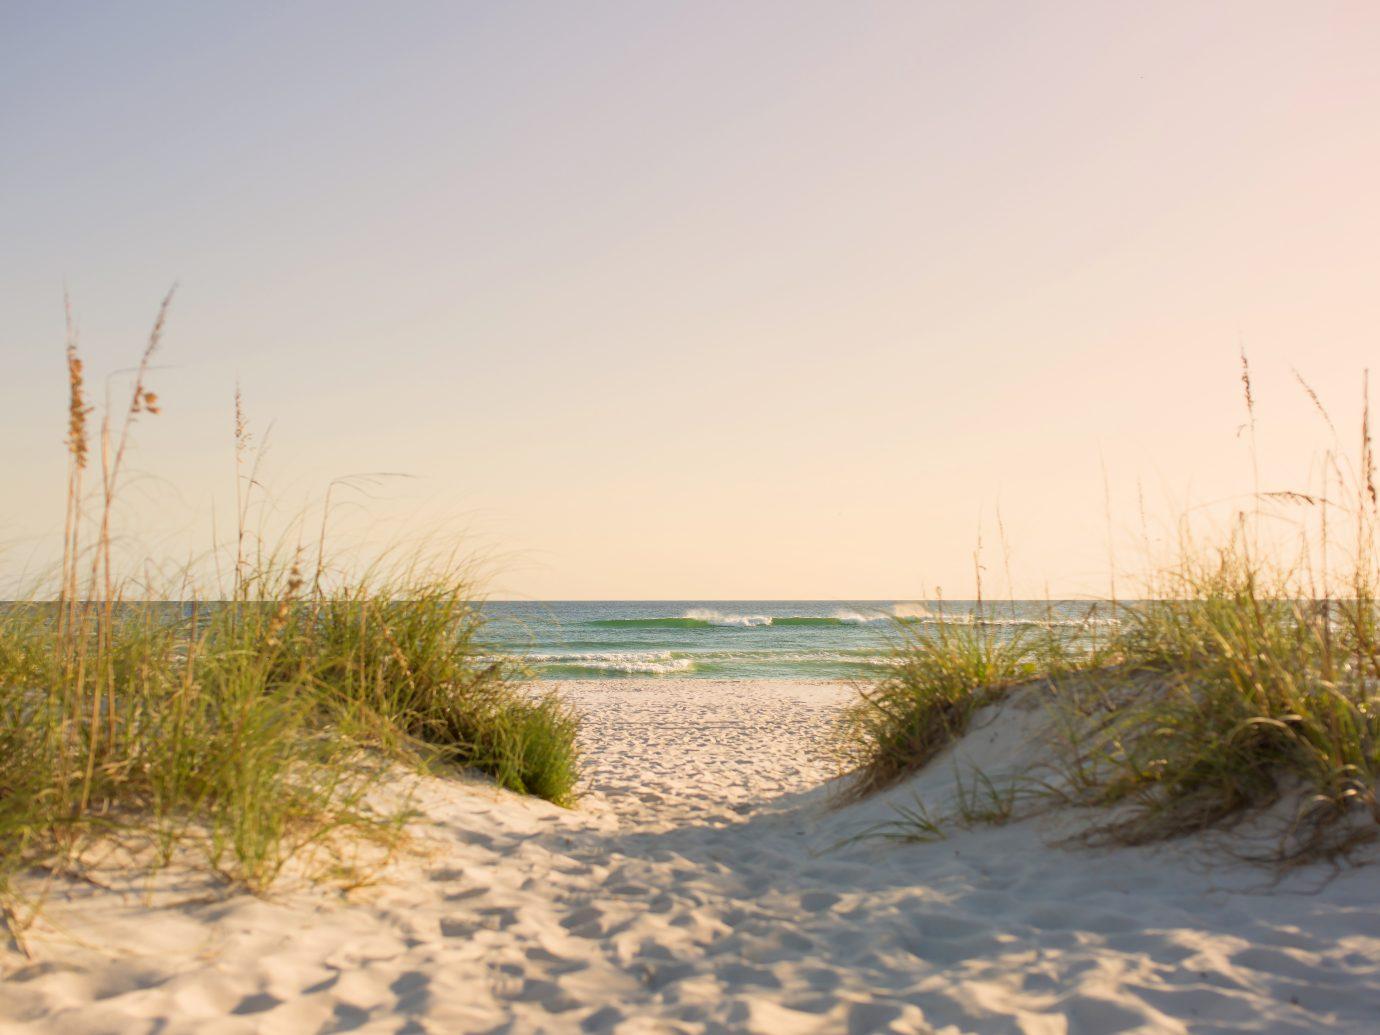 Pure beach image on coast of Florida